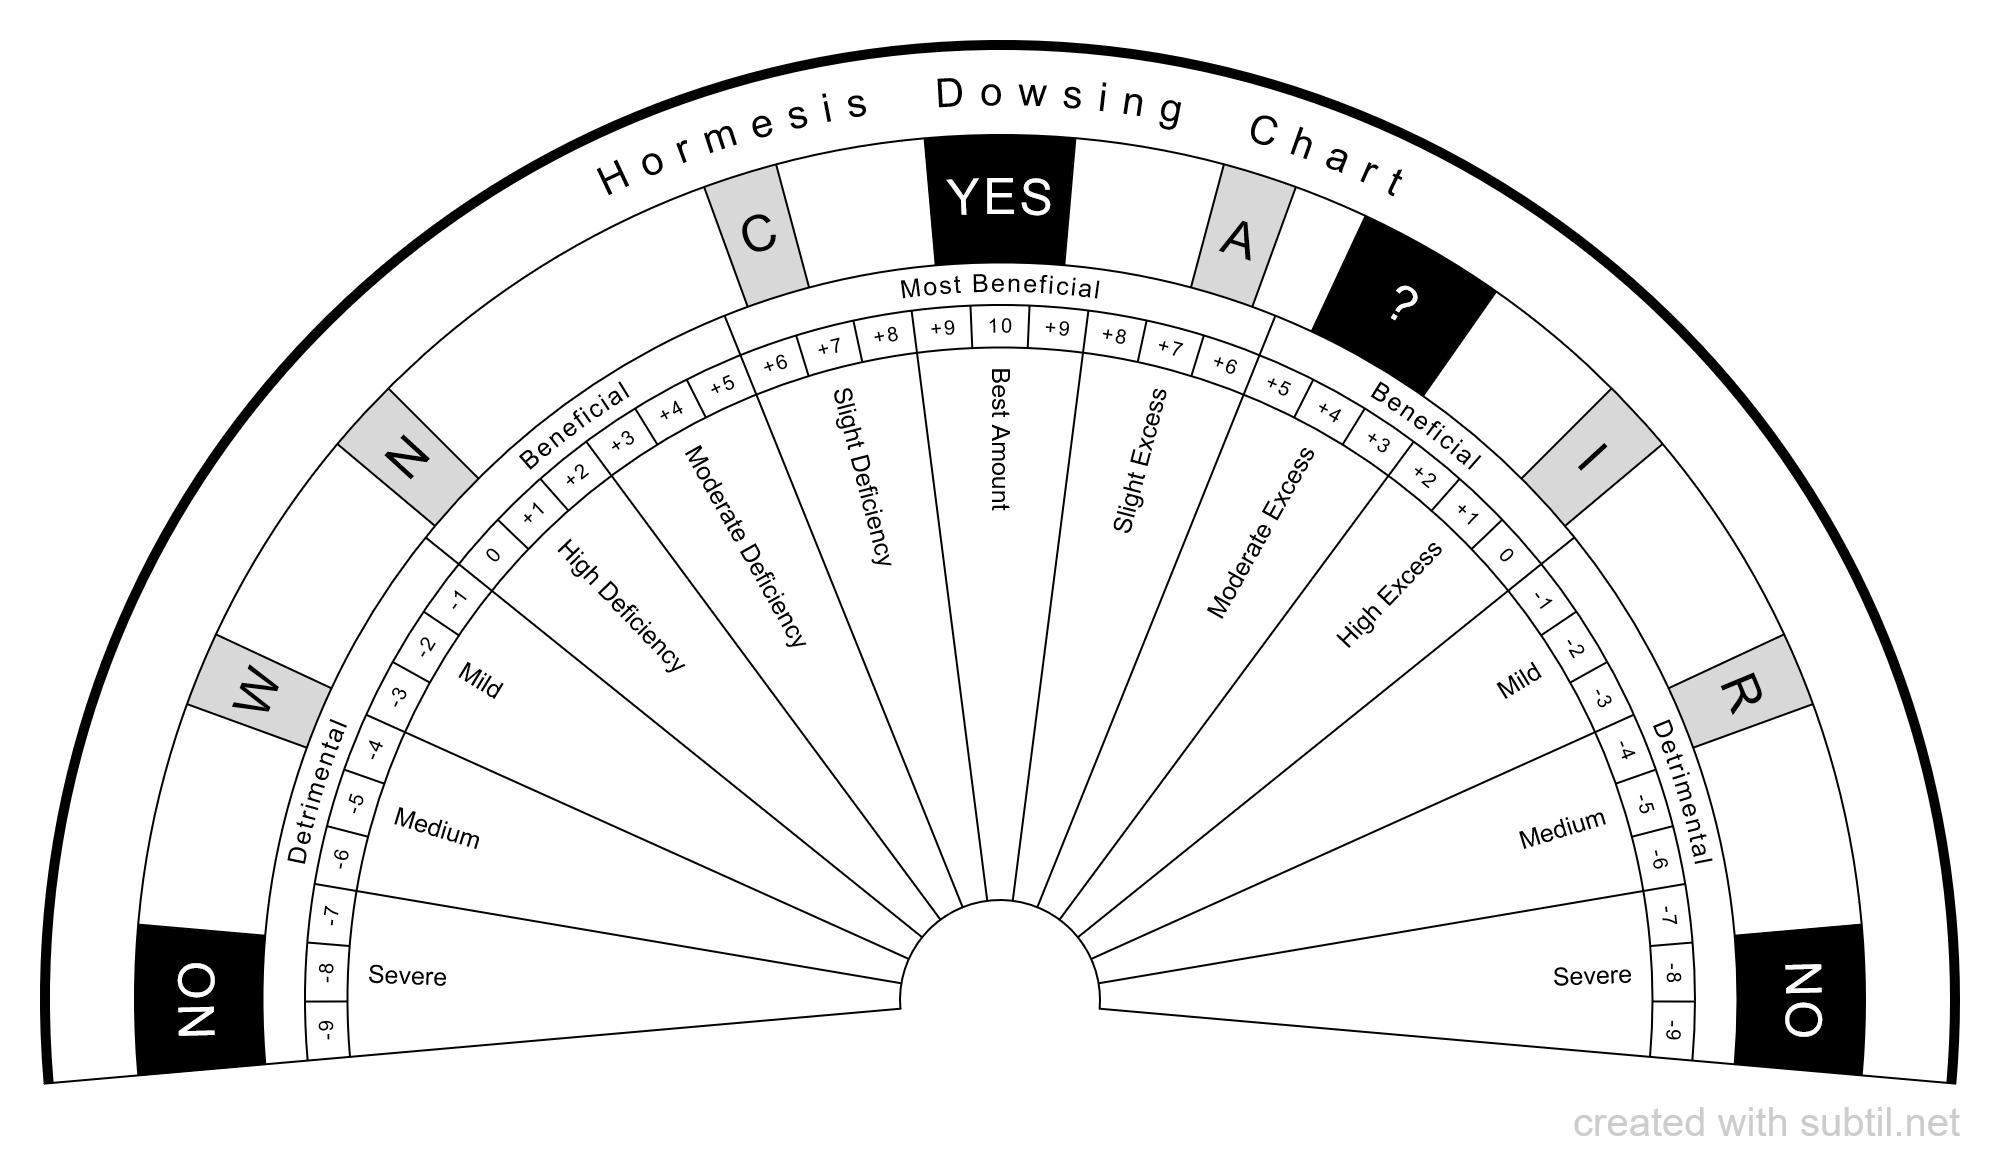 Subtil Sharing And Creation Of Dowsing Pendulum Charts Page 1 Star Desc Dowsing Chart Dowsing Pendulum Dowsing